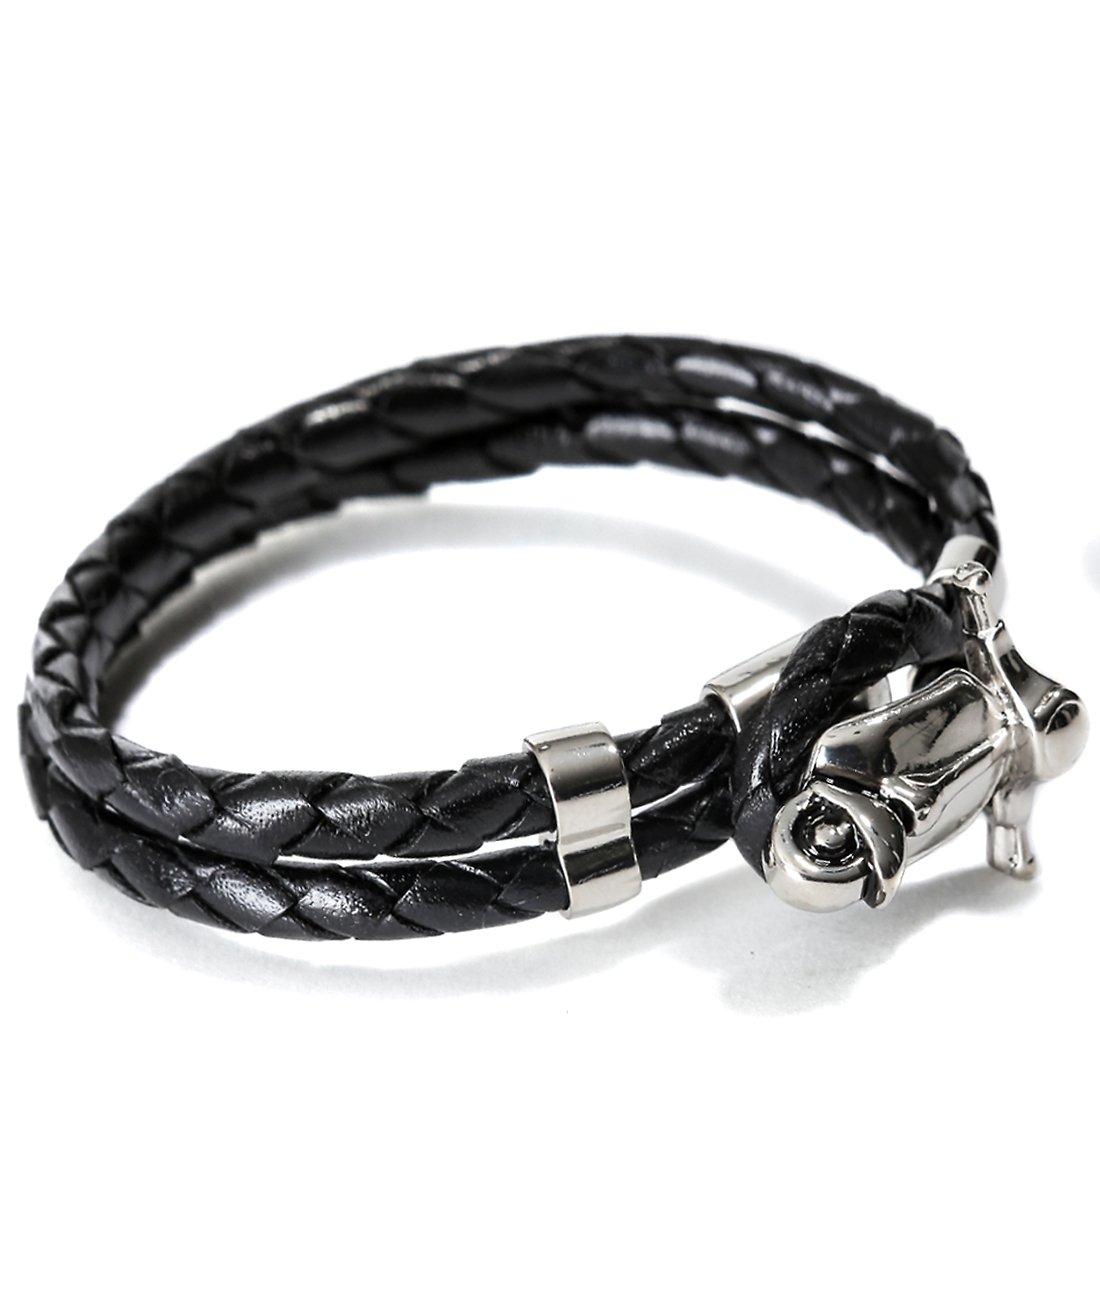 Mon Art Women's Braided Bracelet with Metal Toggle S Black